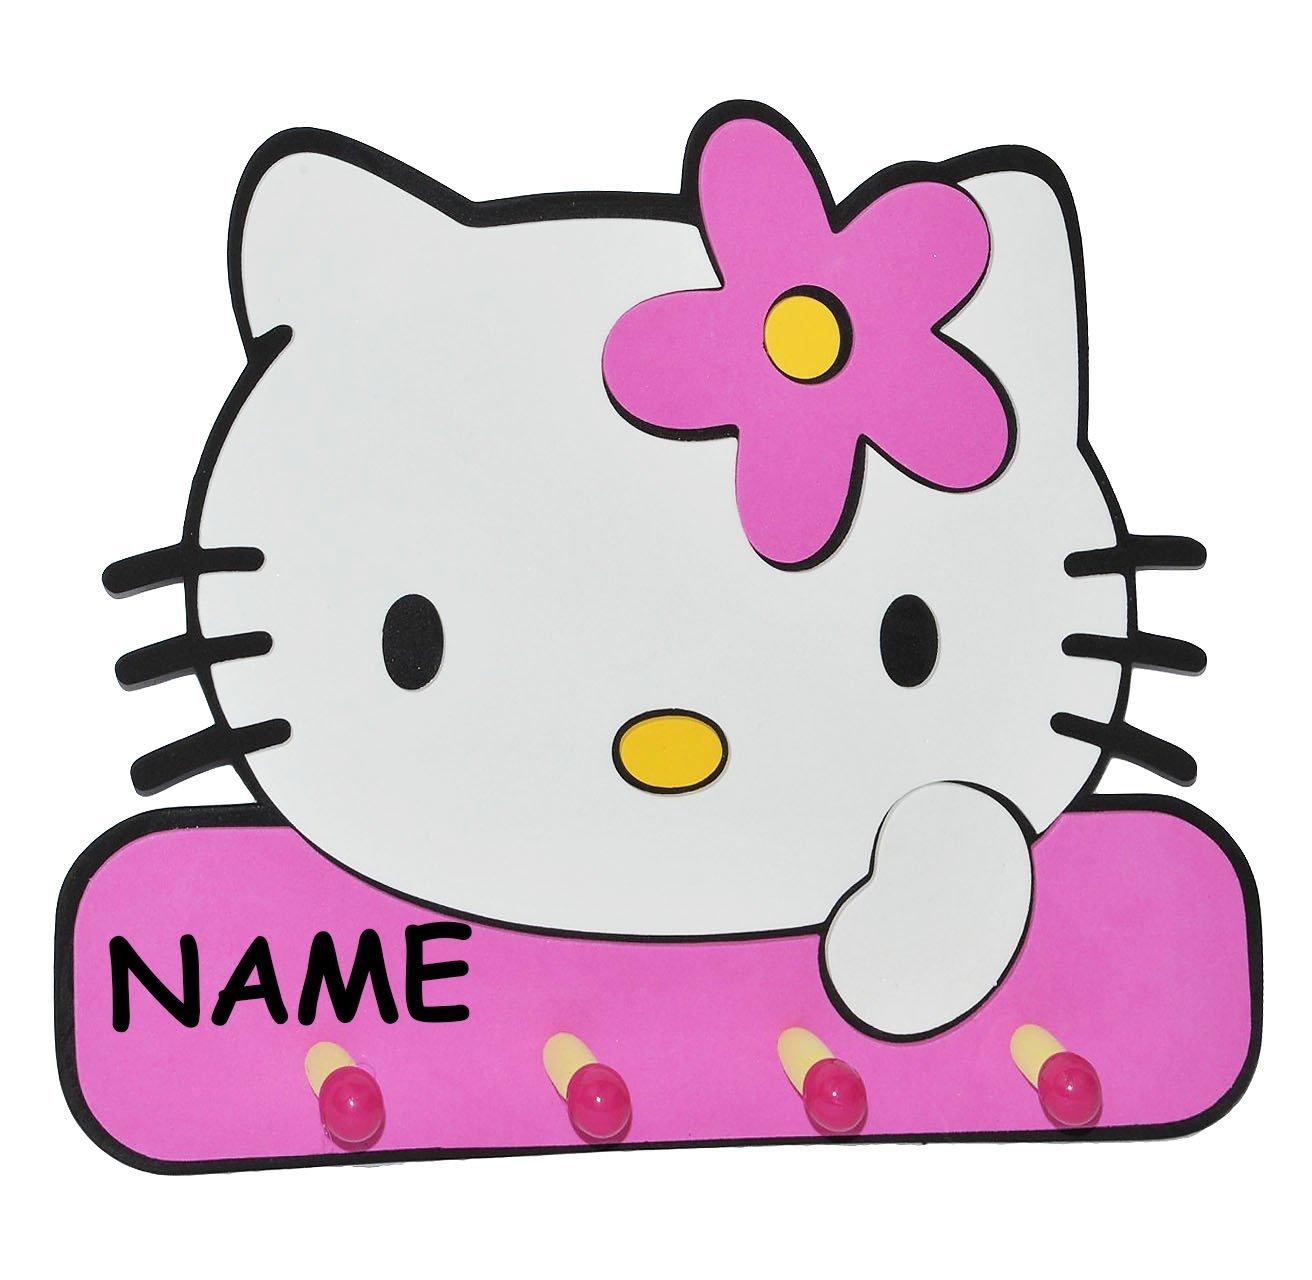 3-D Garderobe - Hello Kitty incl. Namen - mit 4 Kleiderhaken ...